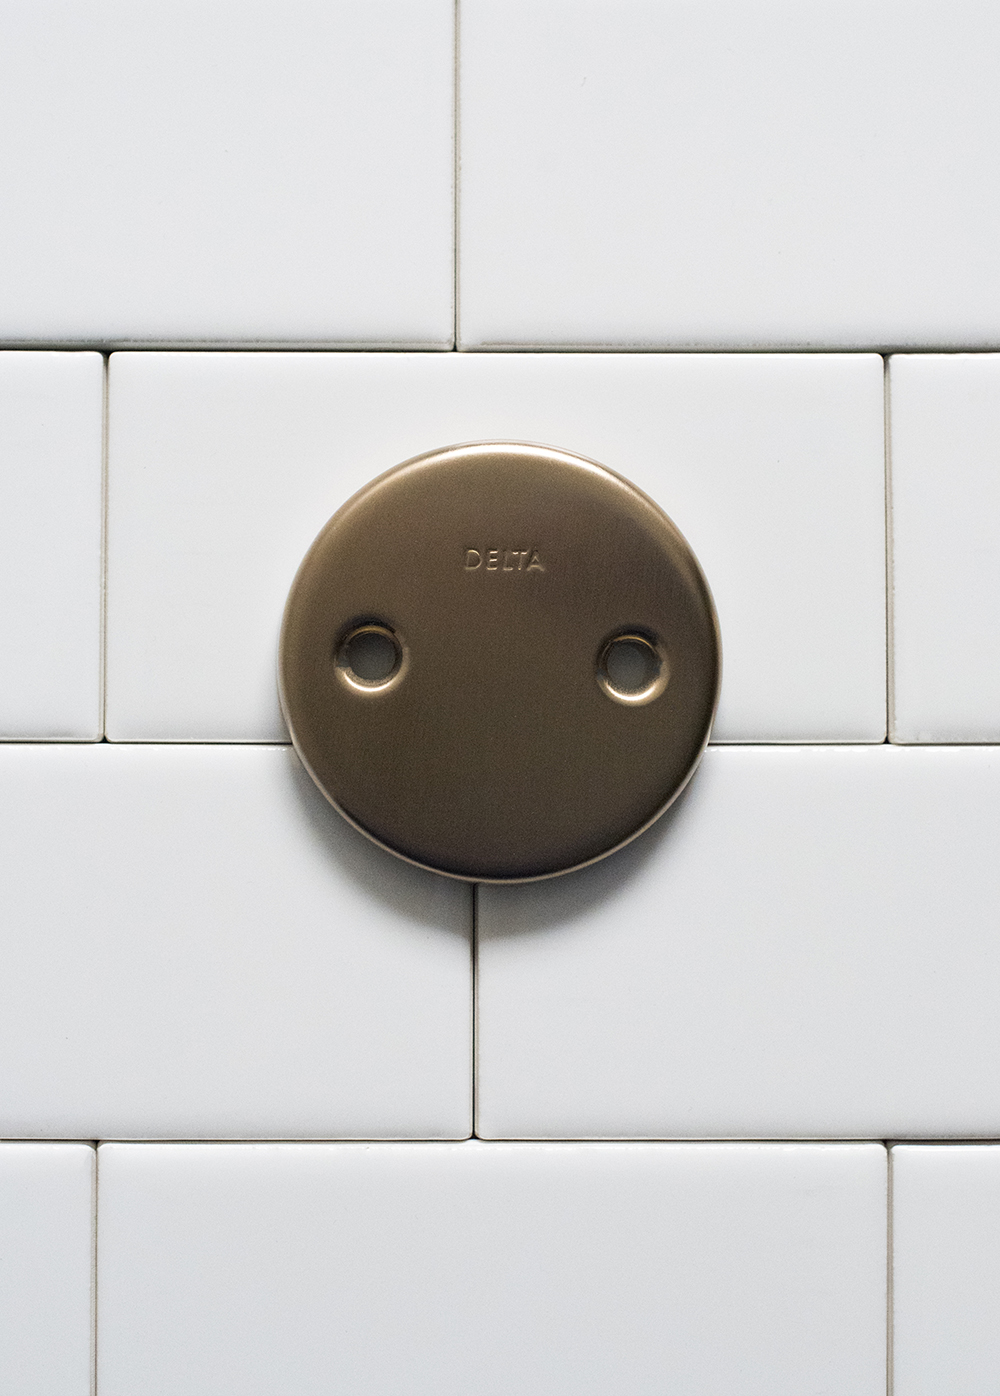 How to Choose Cohesive Bathroom Plumbing Fixtures - roomfortuesday.com